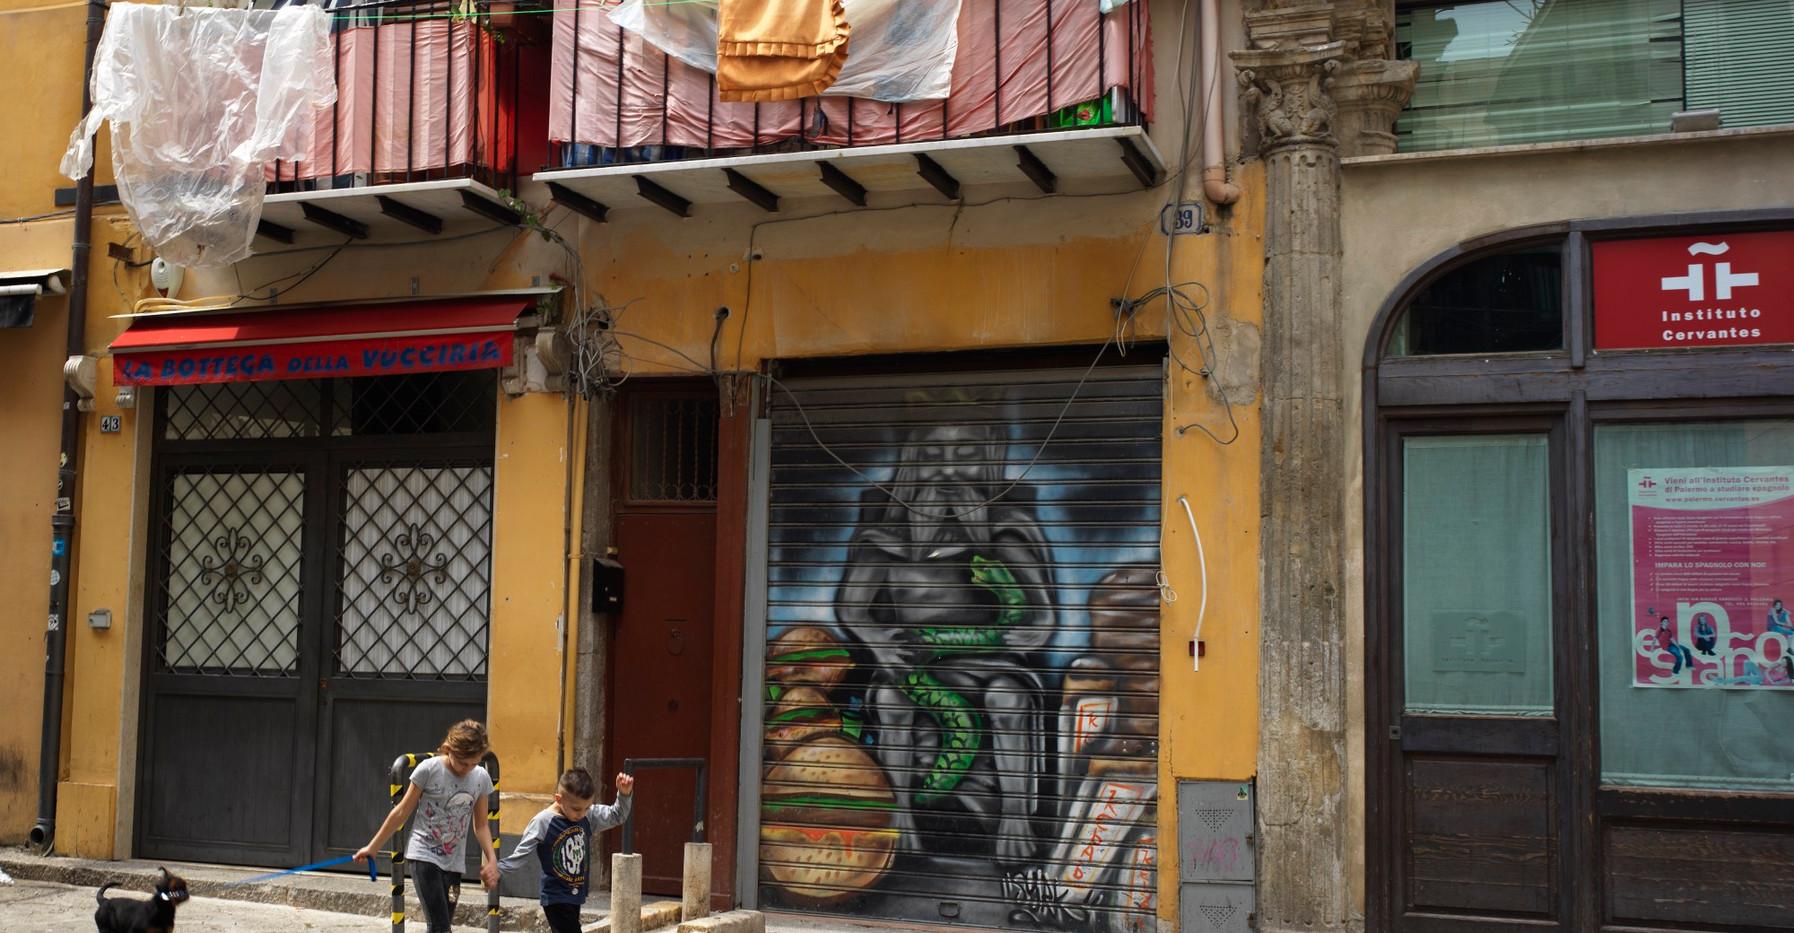 Palermo#05